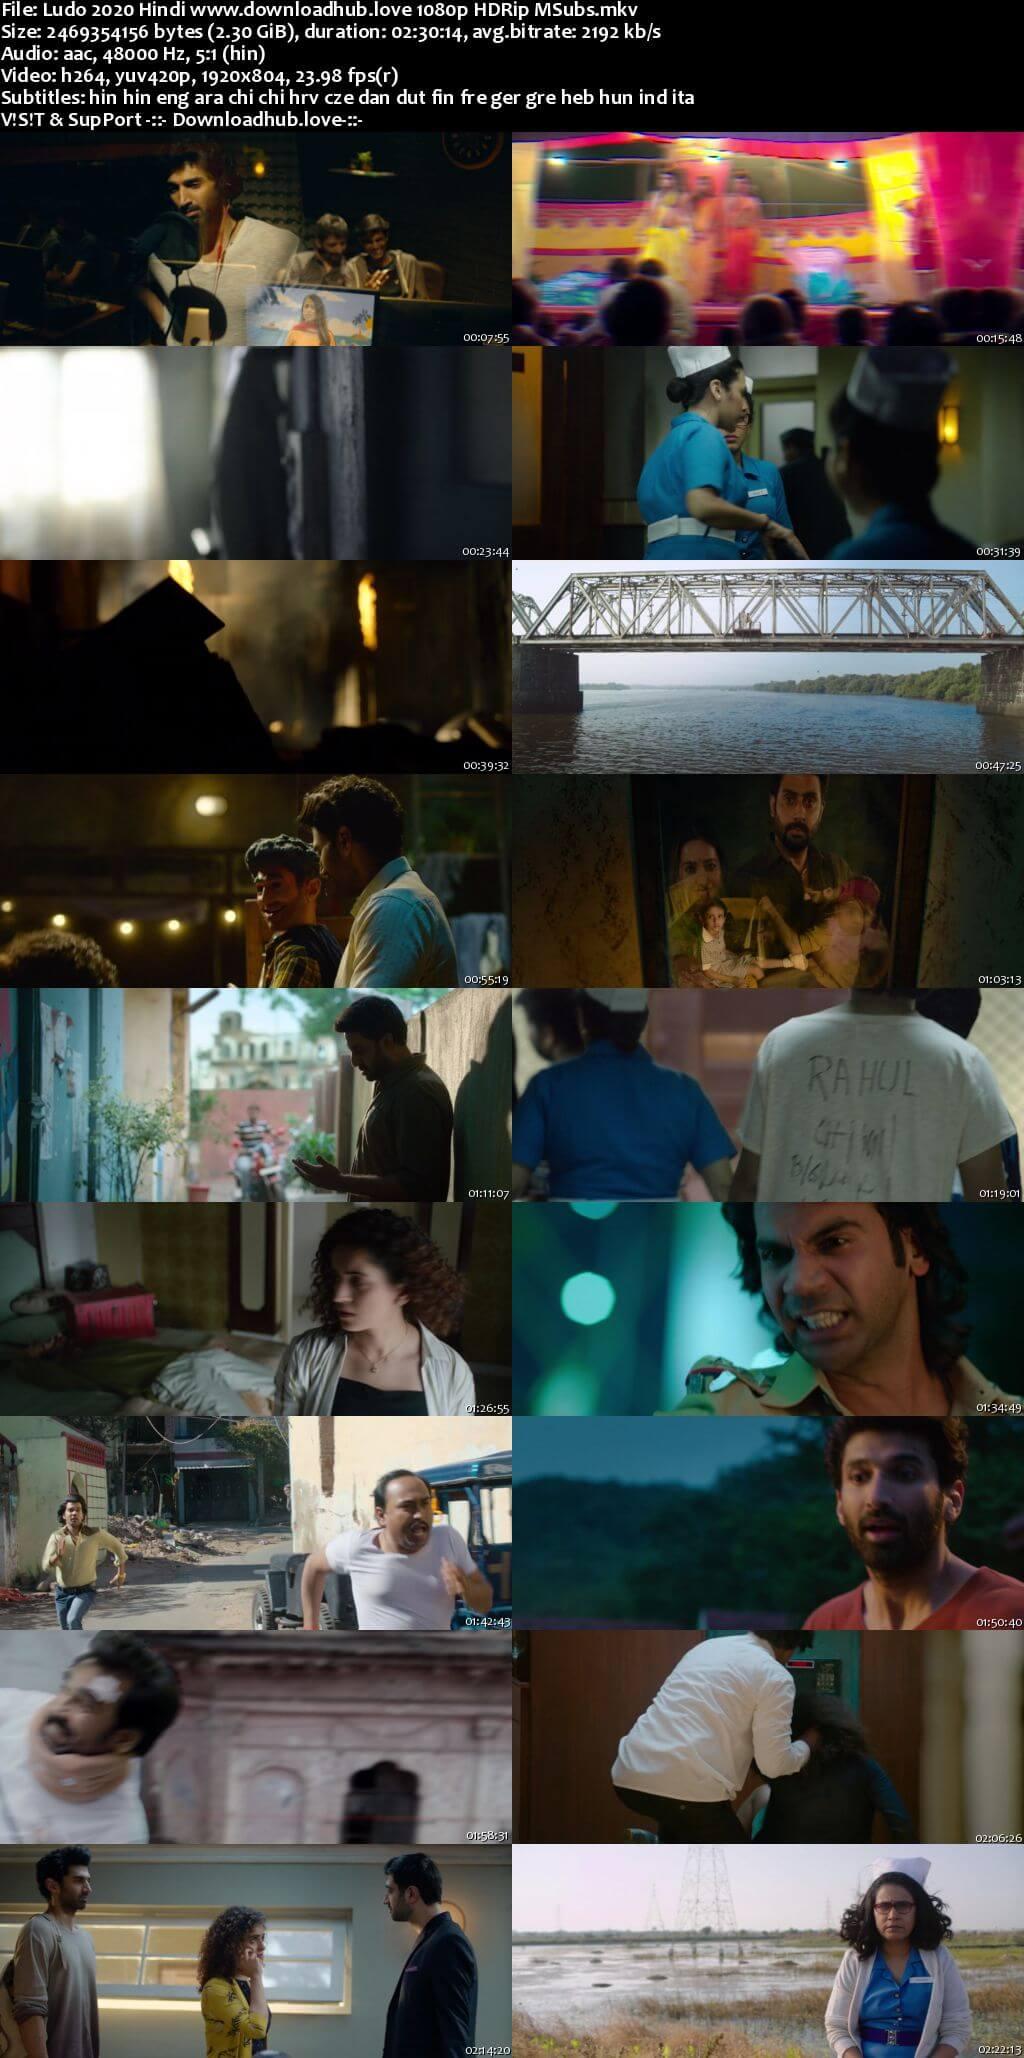 Ludo 2020 Hindi 1080p HDRip MSubs